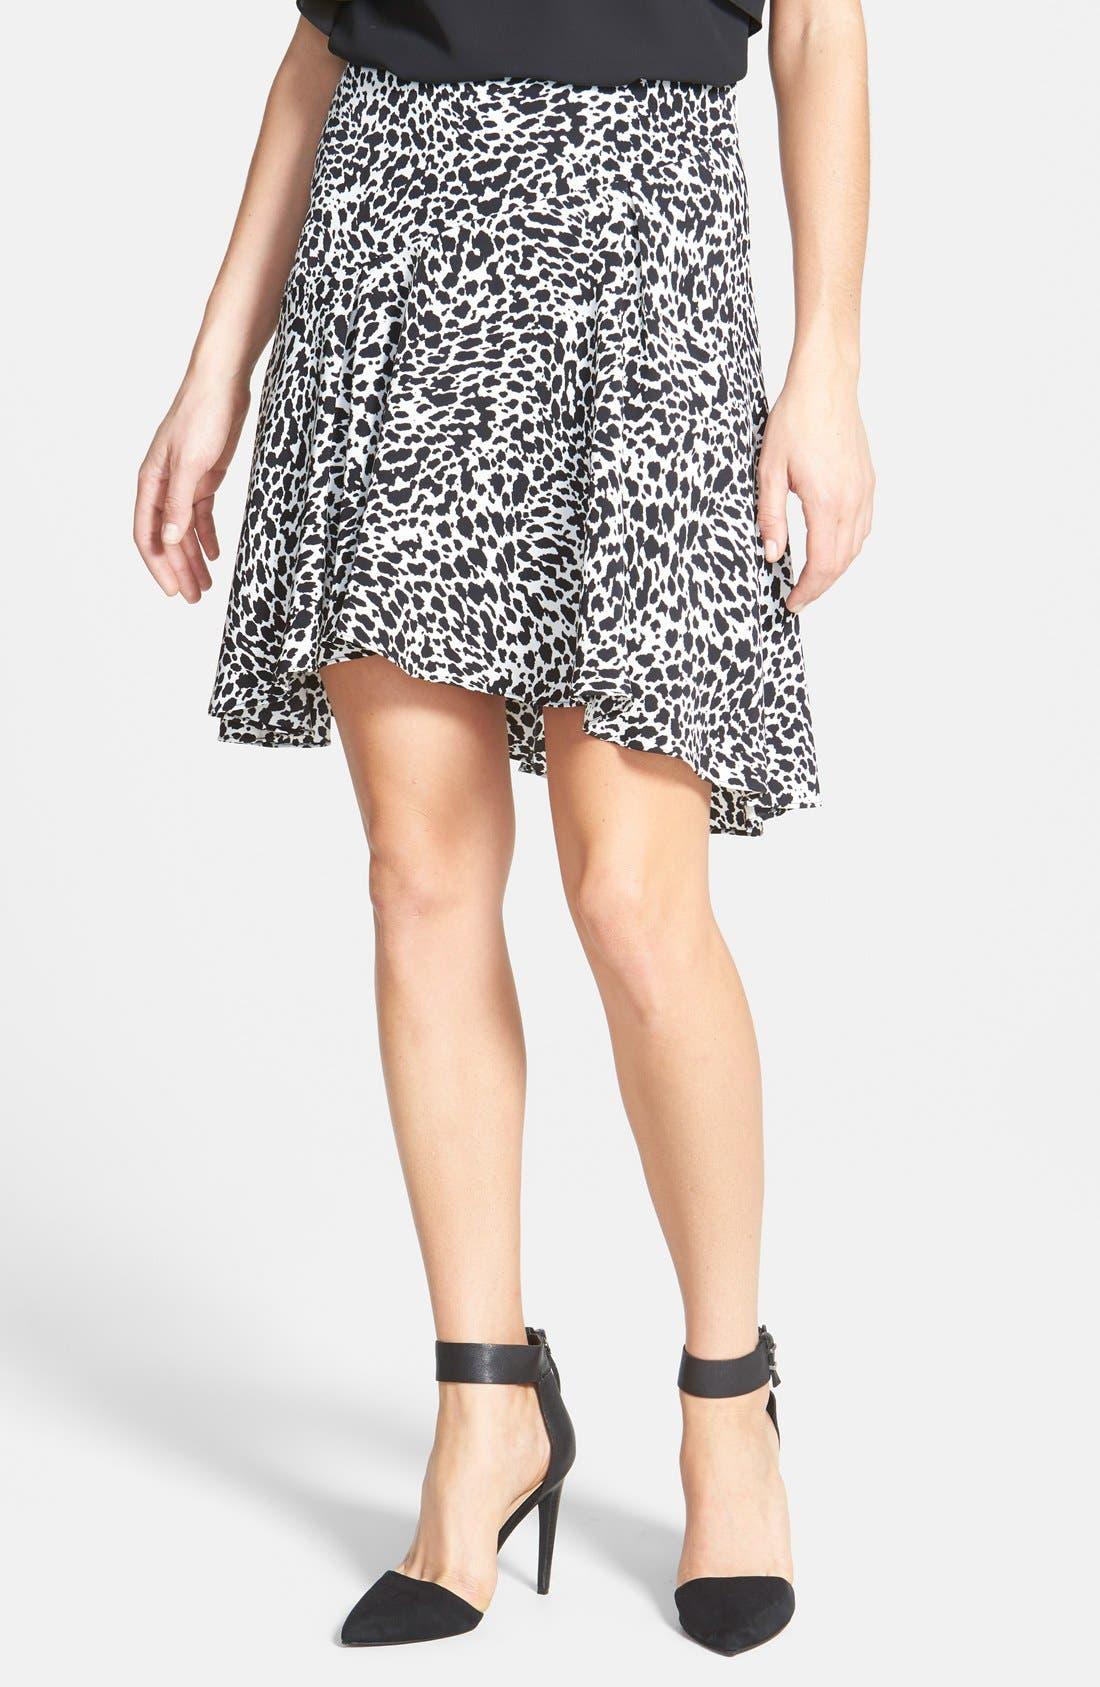 Alternate Image 1 Selected - Vince Camuto 'Animal Flurry' Asymmetrical Flounce Skirt